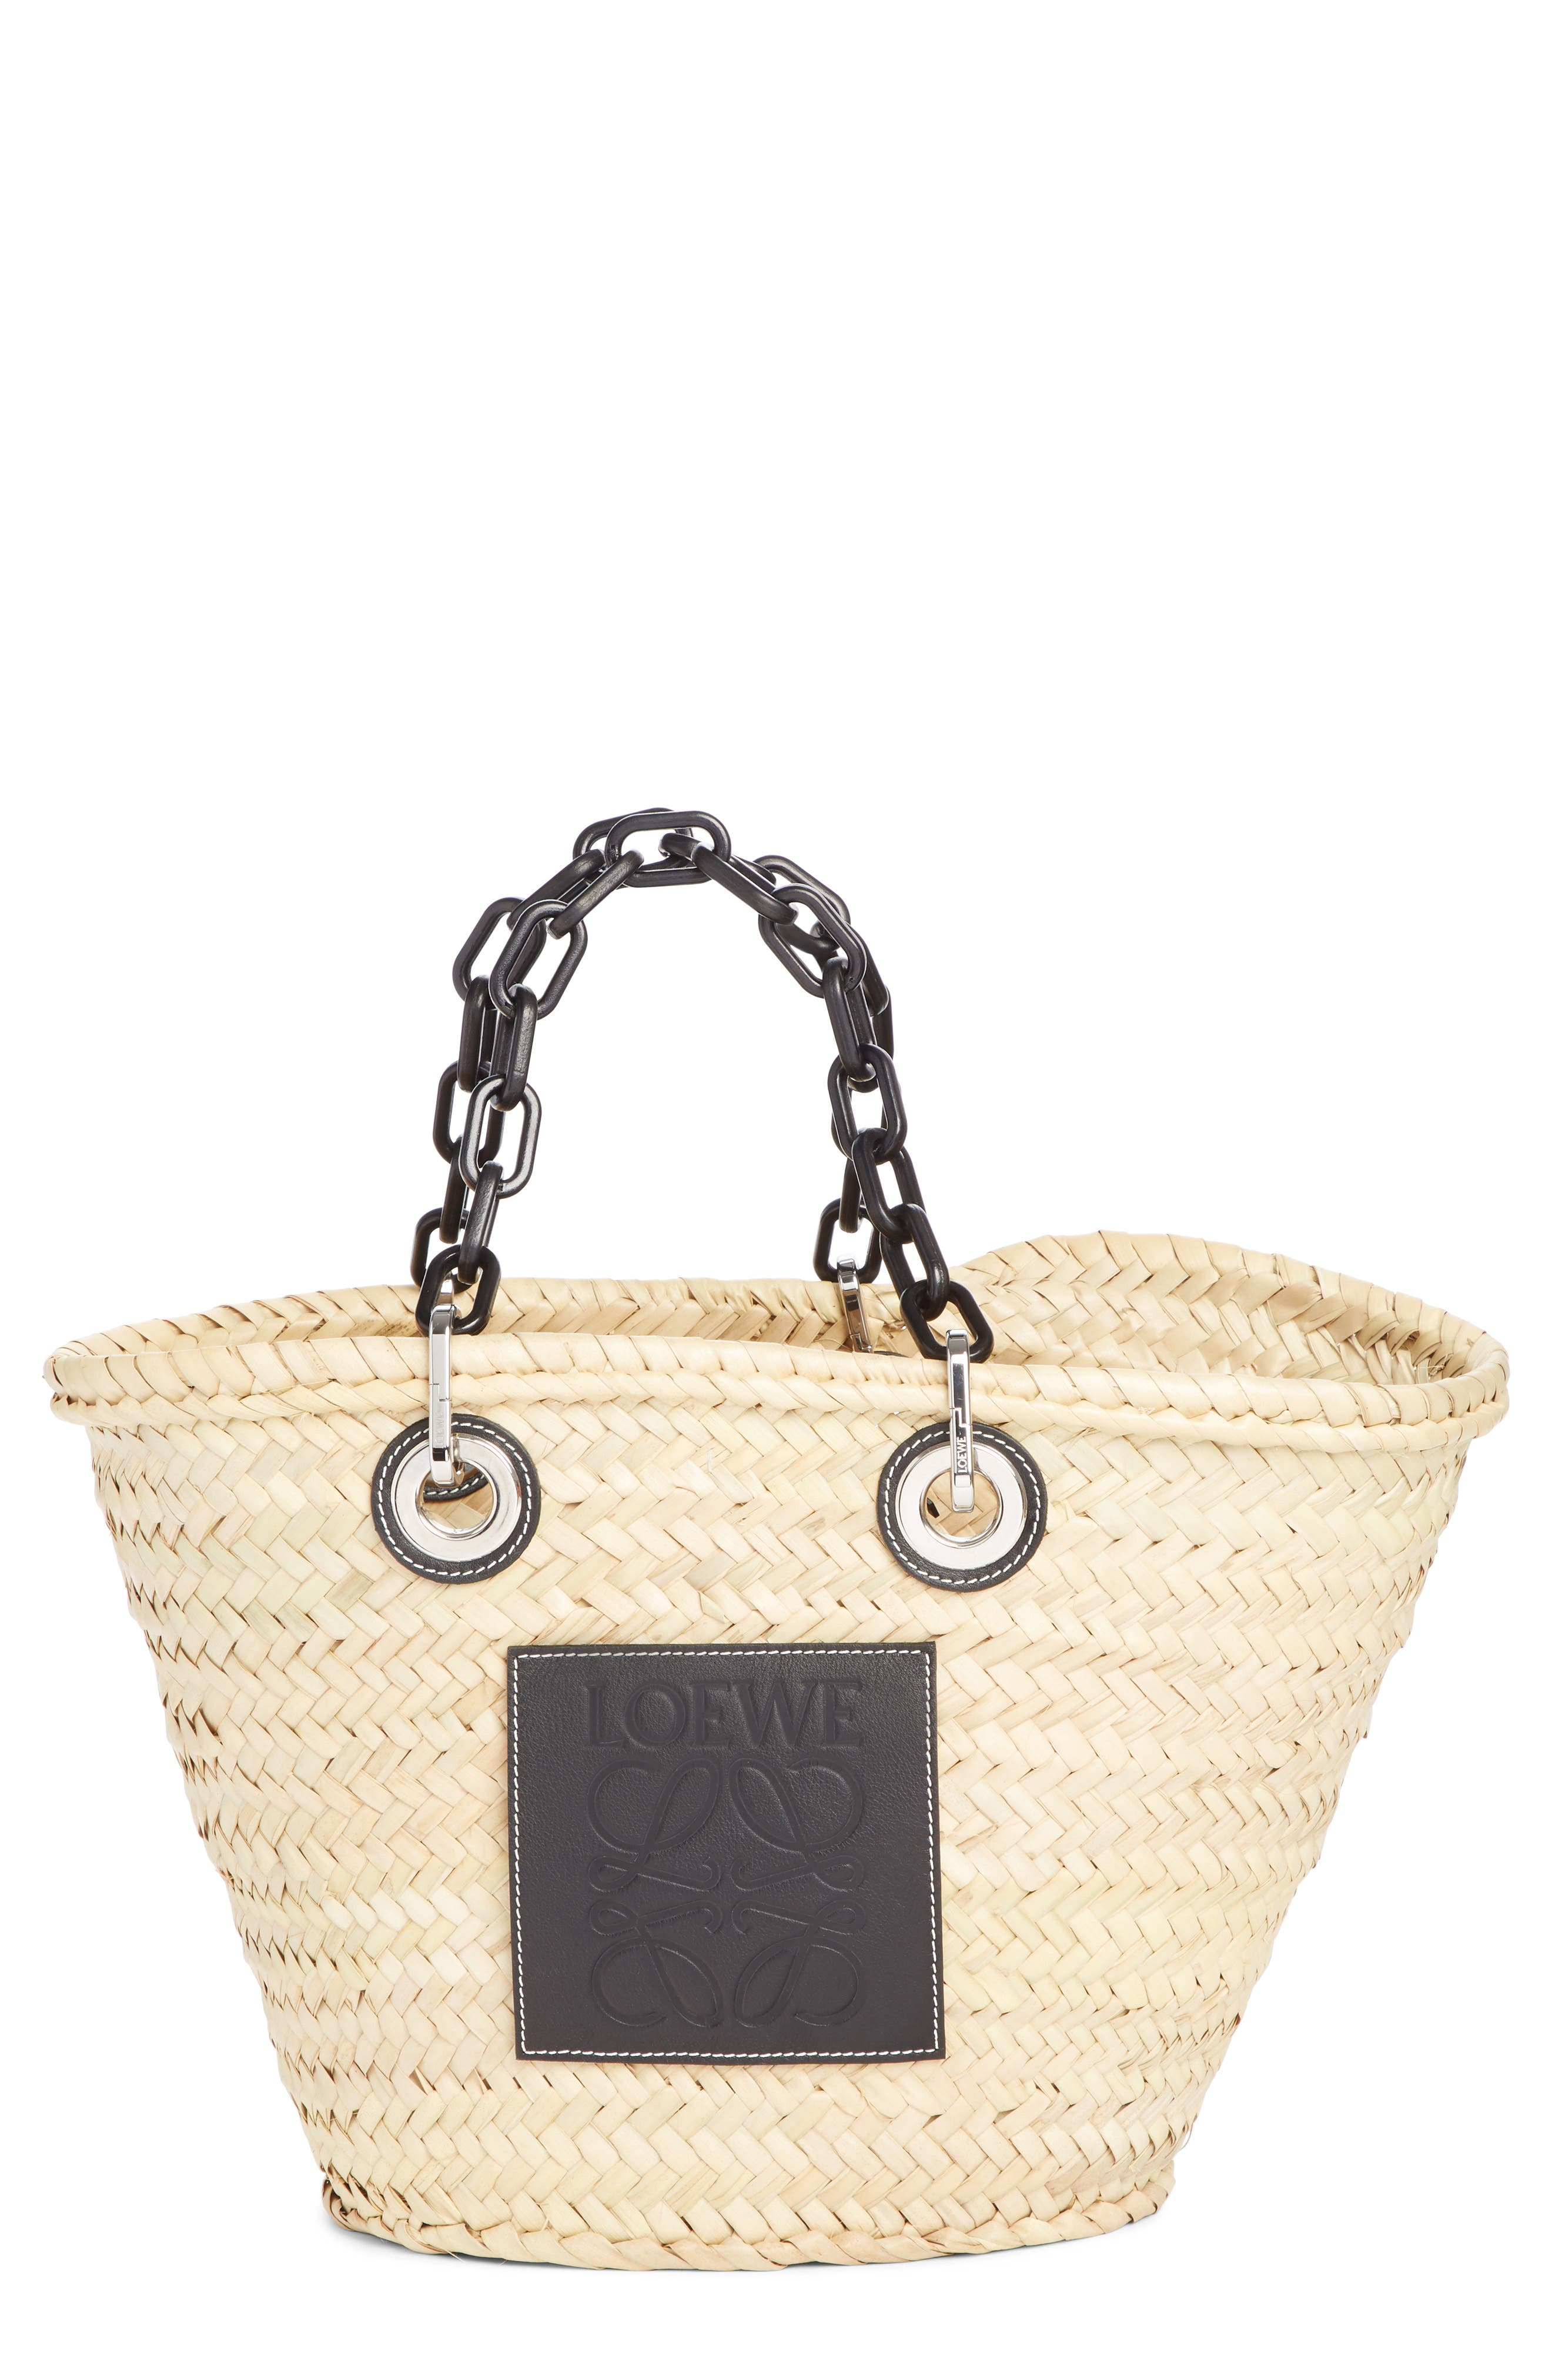 LOEWE Chain Handle Woven Palm Market Basket, Main, color, NATURAL/ BLACK